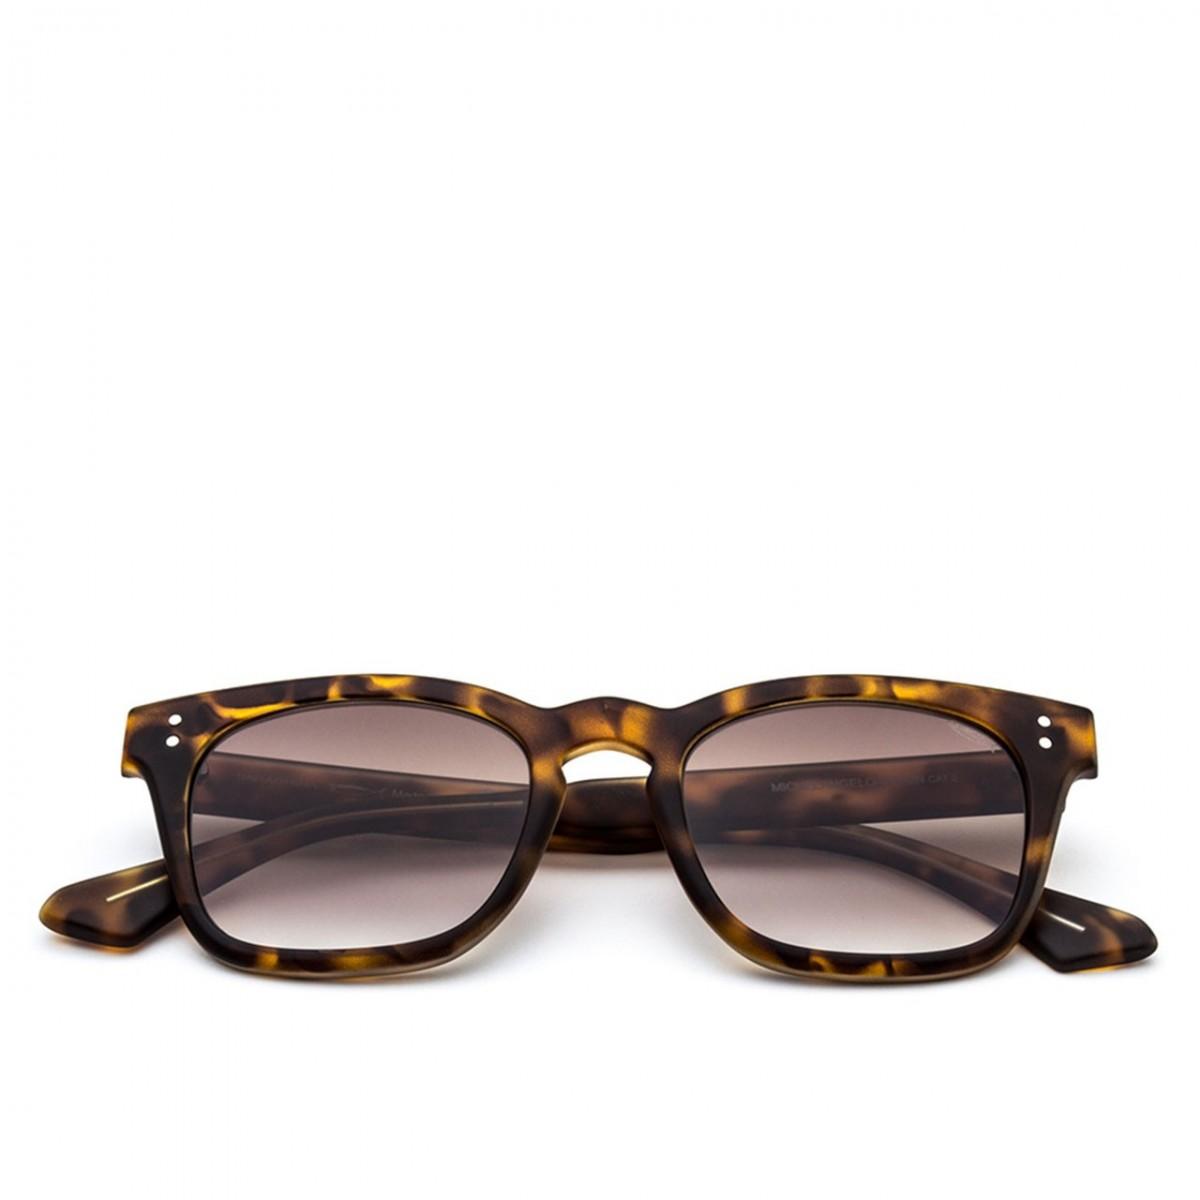 88a756893 Saraghina   Sunglasses Michelangelo Turtle Lens Shaded Brown   SAR_MI